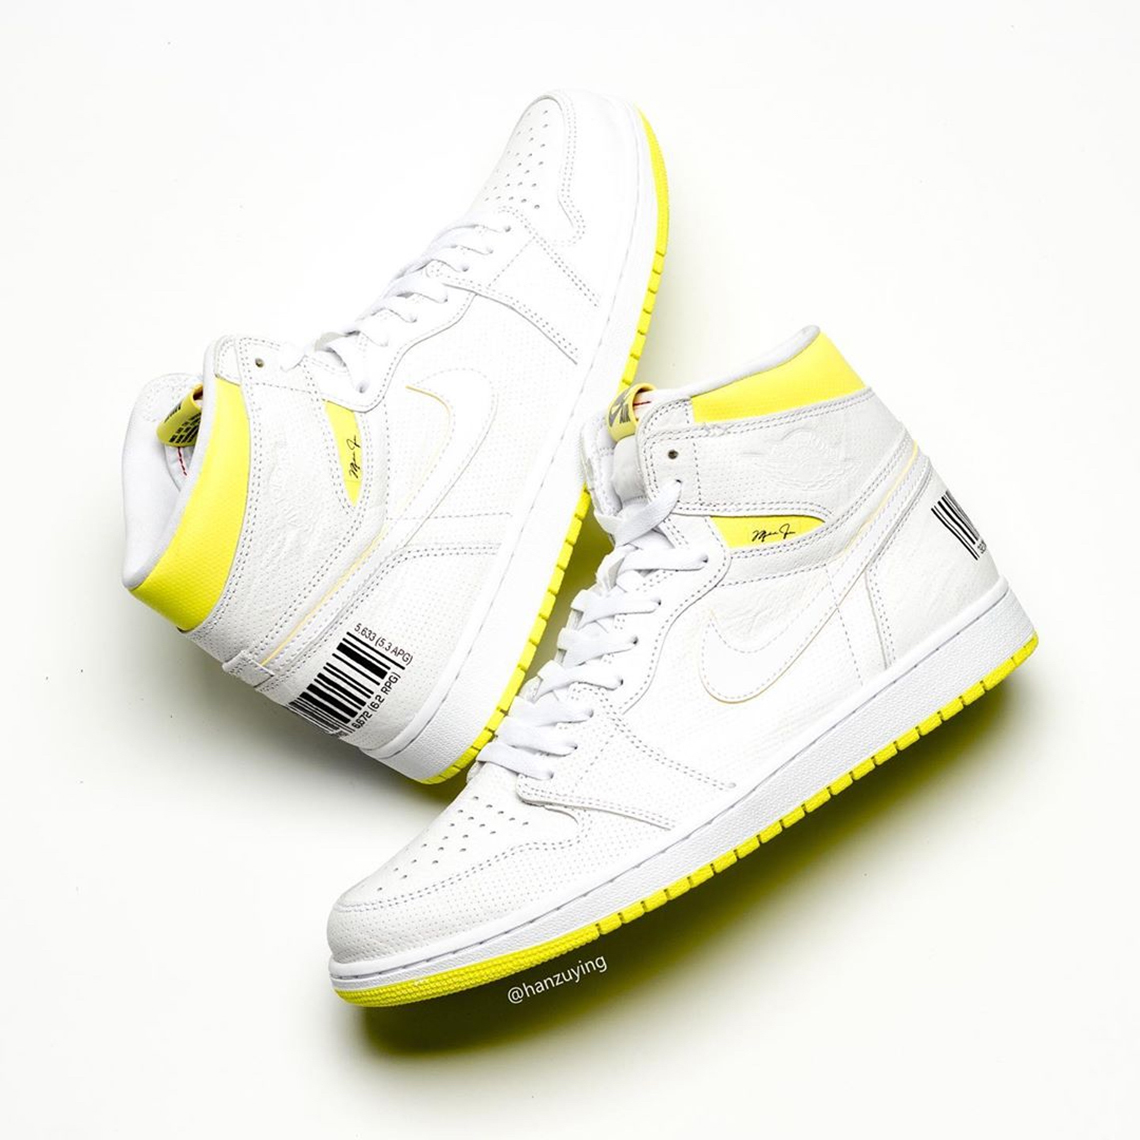 factory outlets amazon half price Air Jordan 1 First Class Flight Release Info | SneakerNews.com